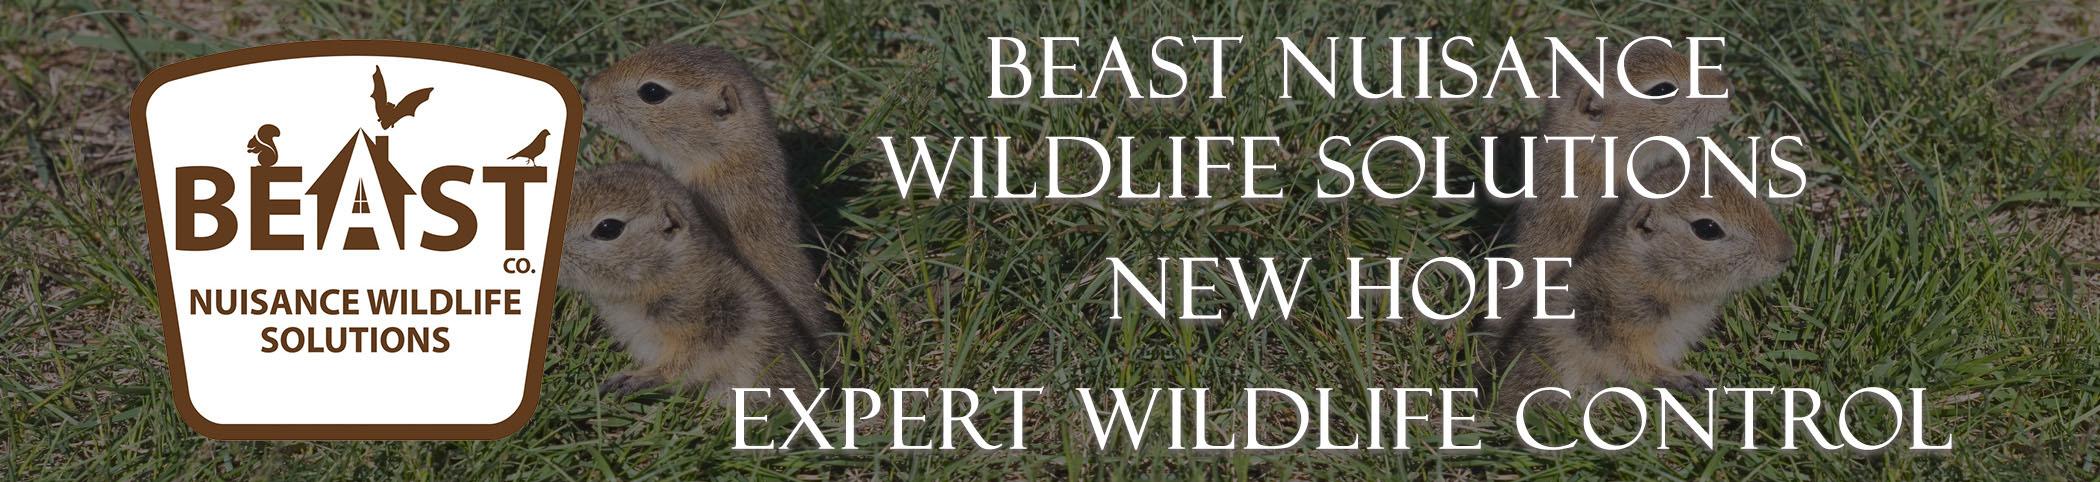 beast_headers_new_hope